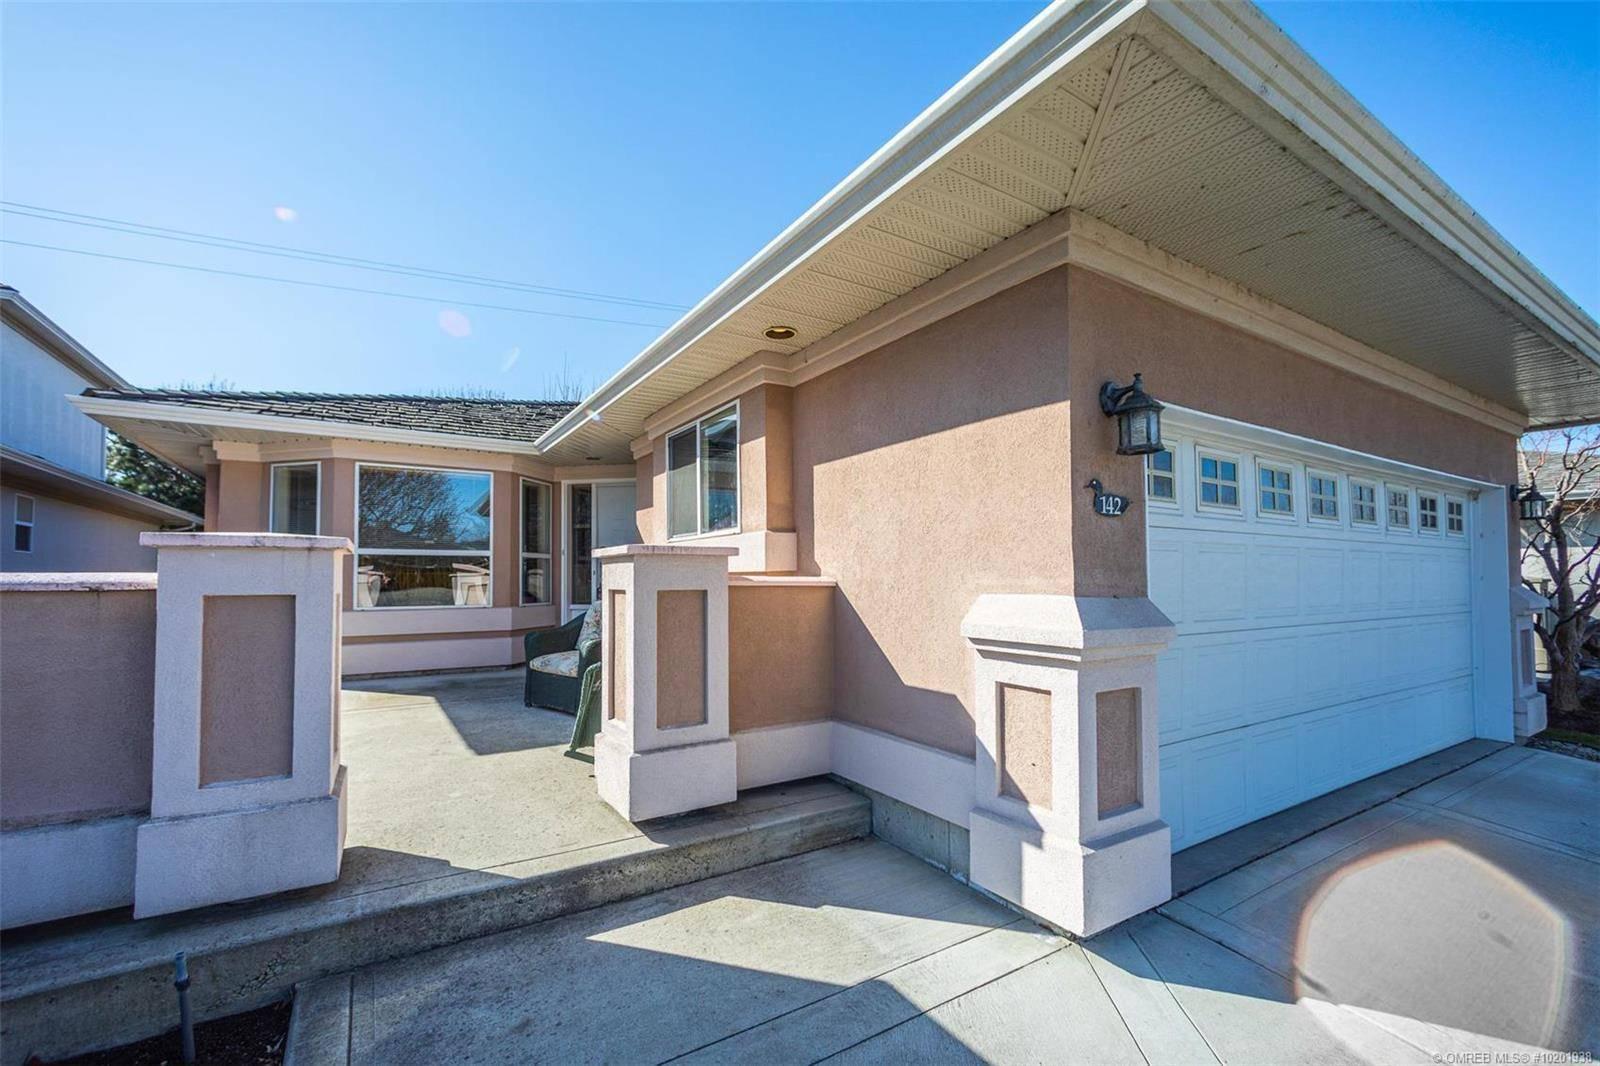 Townhouse for sale at 3788 Bird Pl Unit 142 Kelowna British Columbia - MLS: 10201938